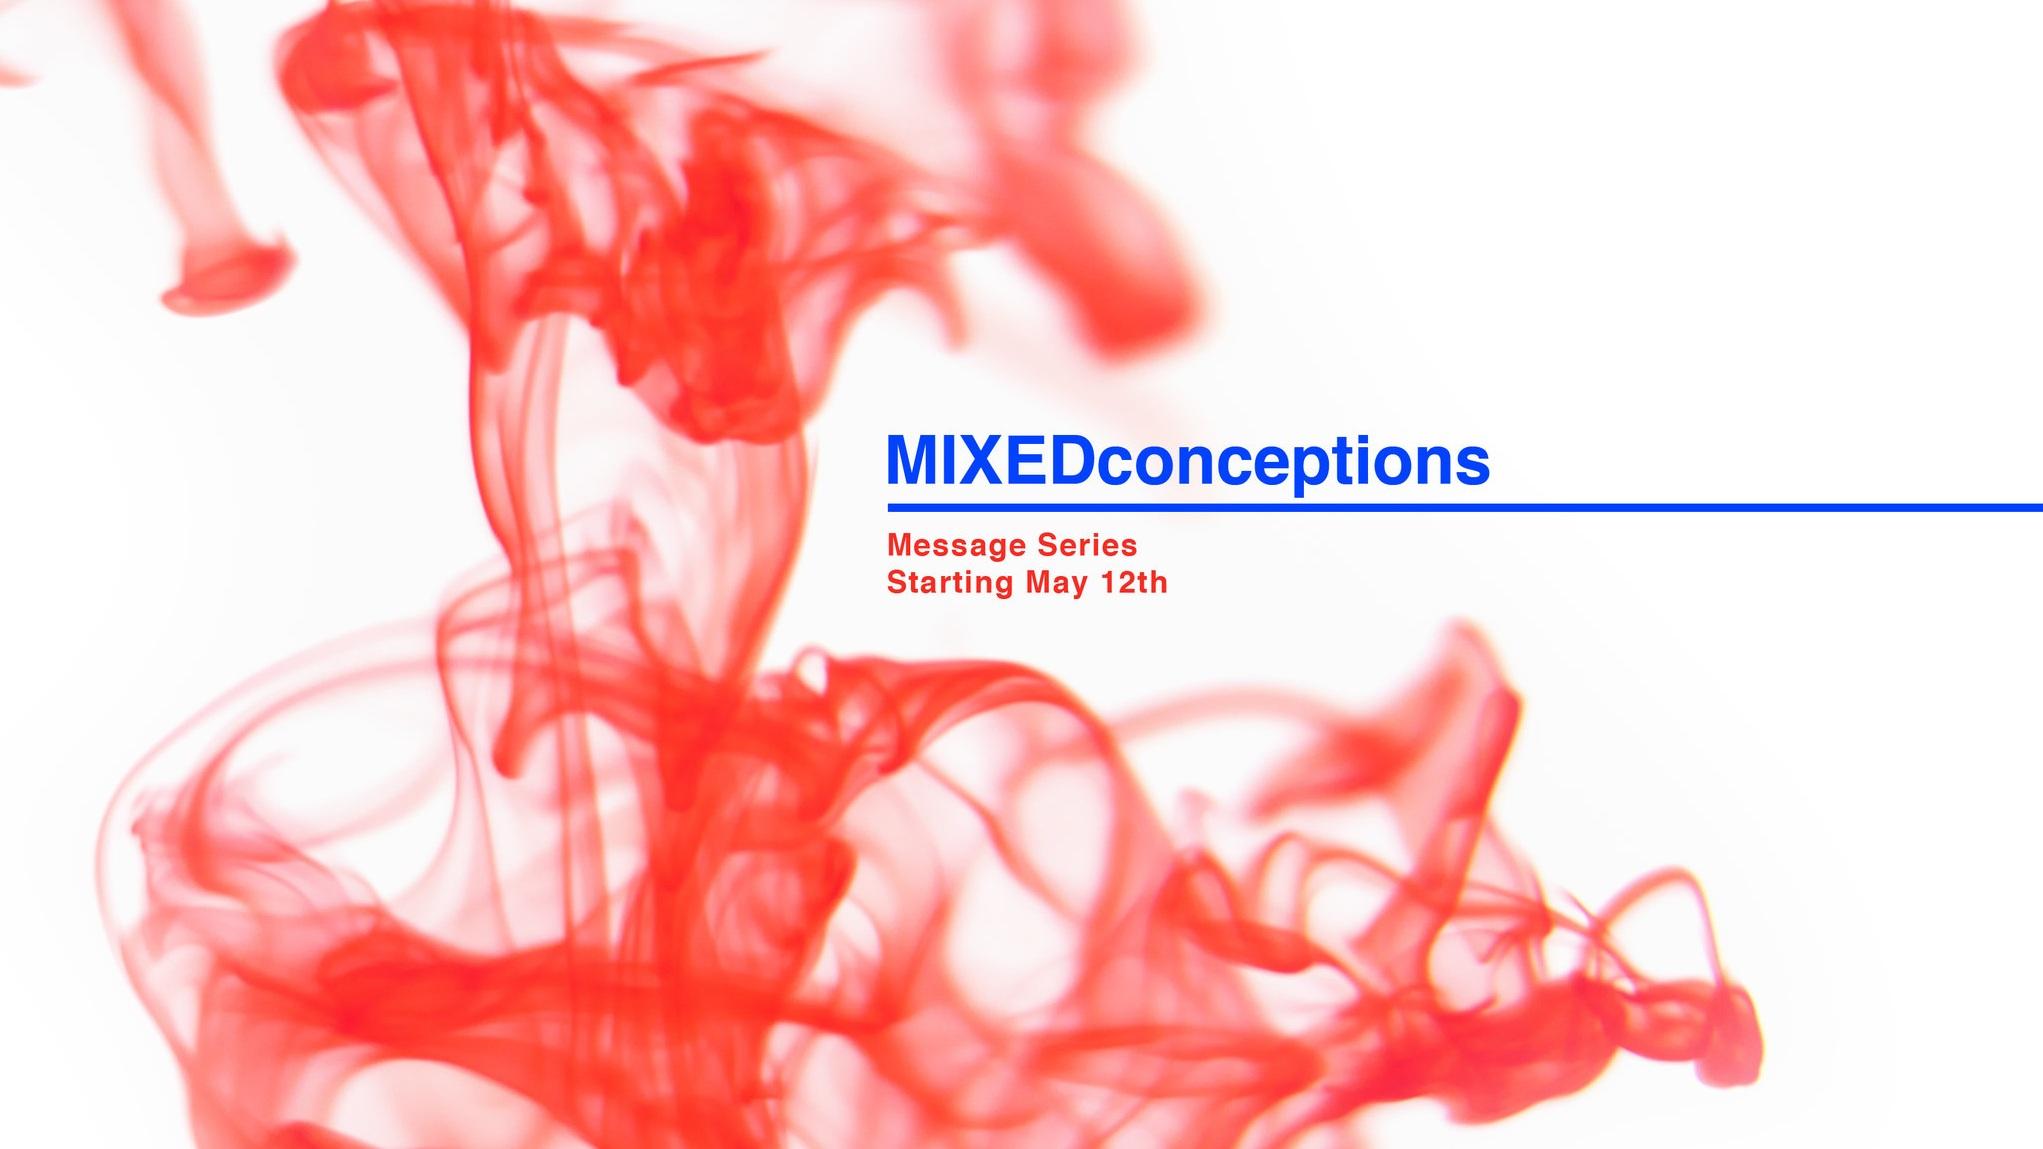 MIXEDconceptions New.jpg